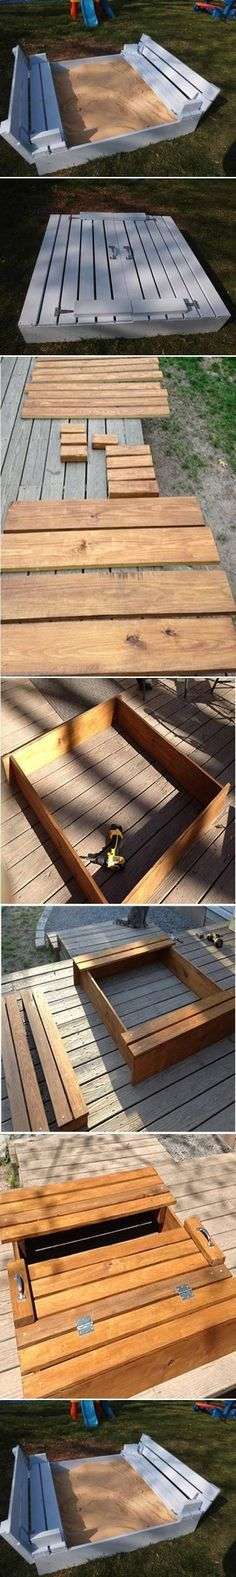 DIY Sandbox for Kids   iCreativeIdeas.com Like Us on Facebook ==> https://www.facebook.com/icreativeideas  www.amandafarwick.com